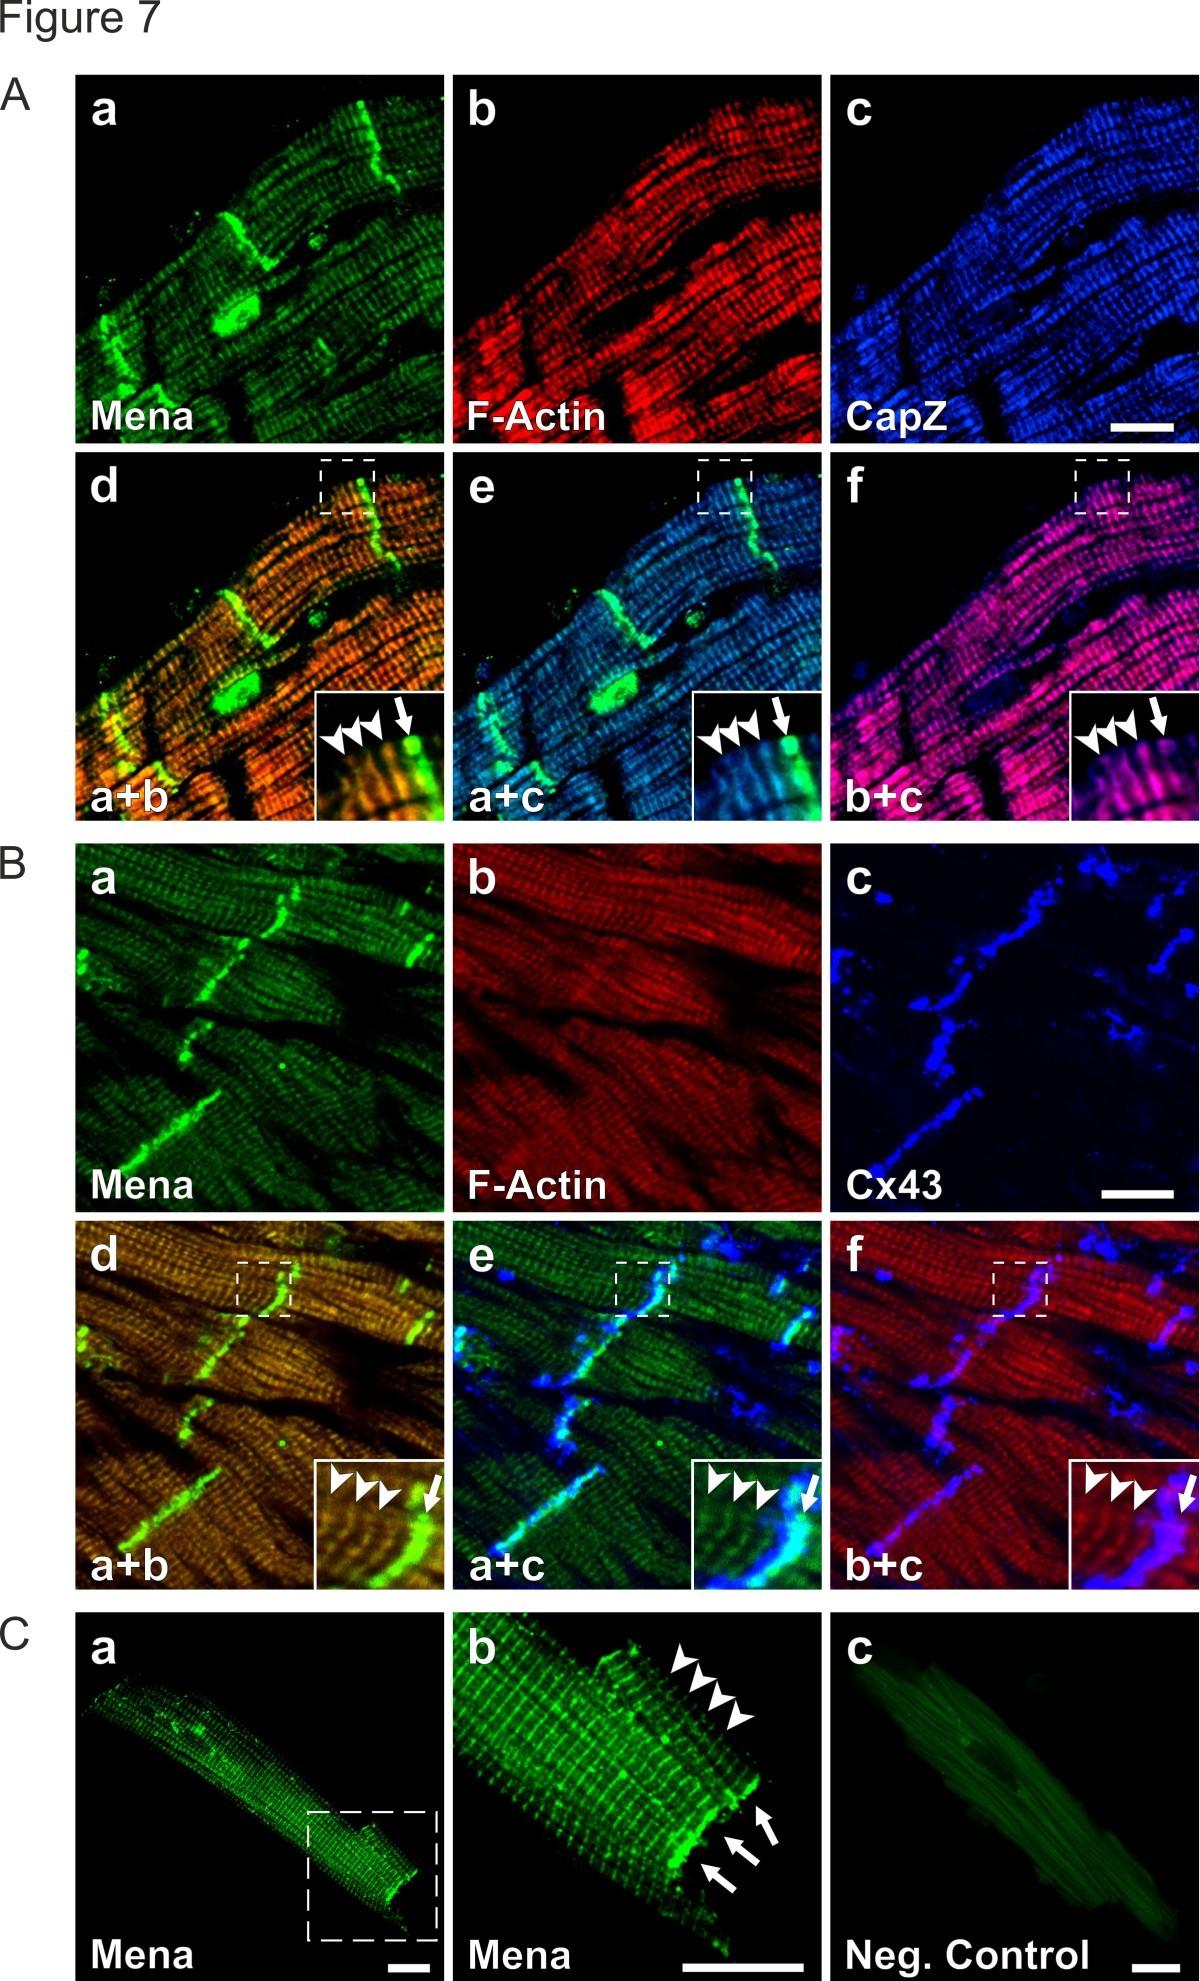 Menavasp And Ii Spectrin Complexes Regulate Cytoplasmic Actin